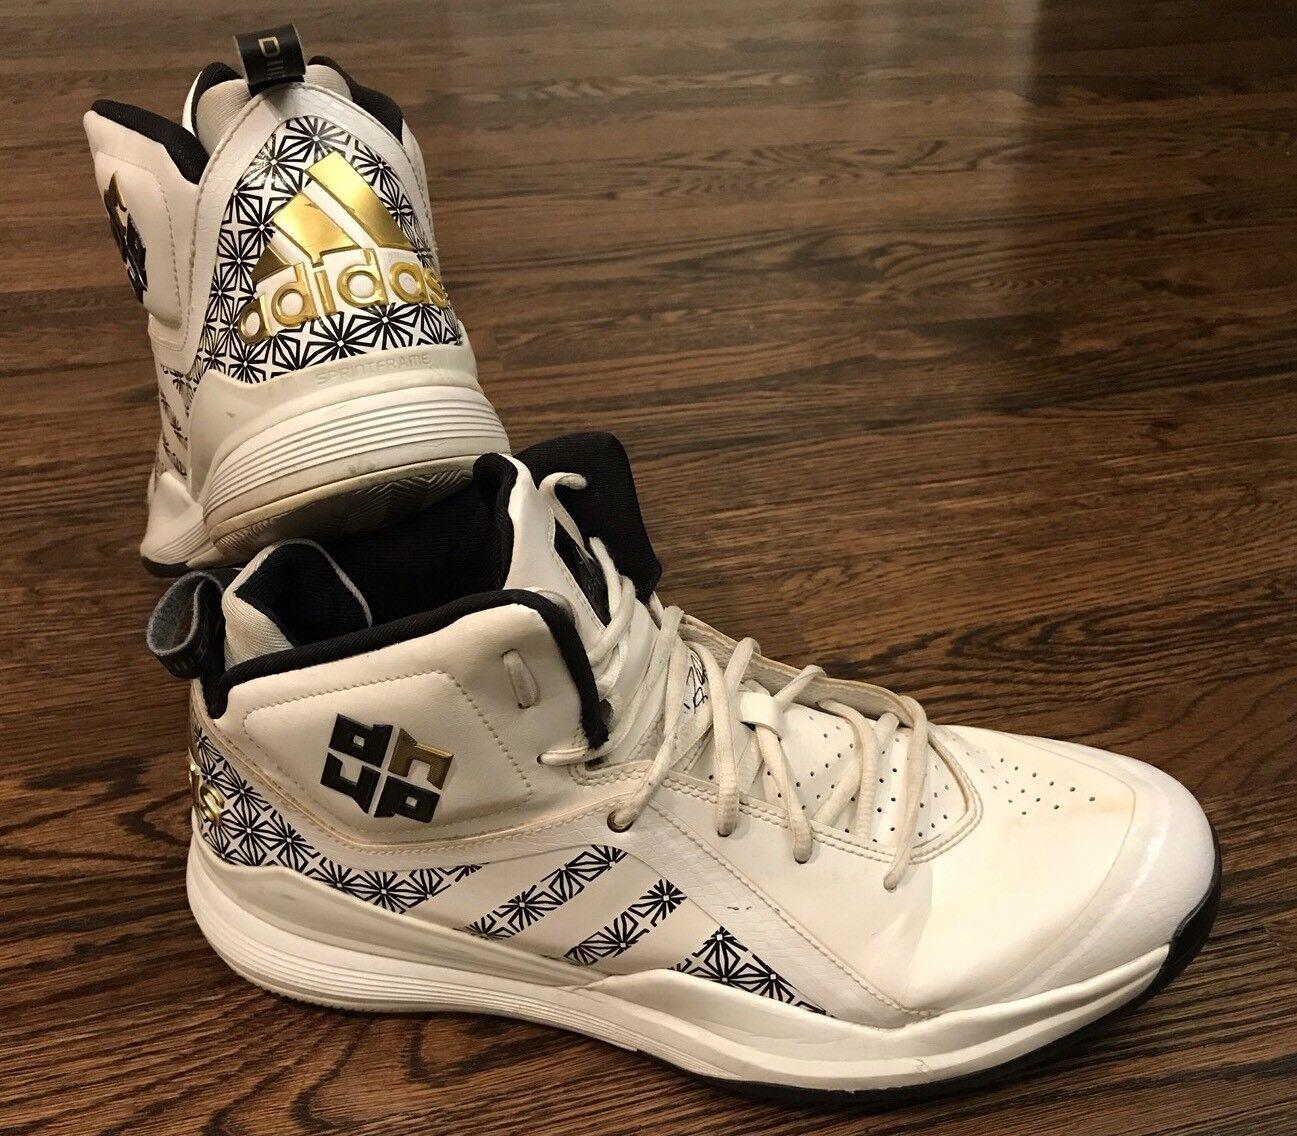 hot sales 0e3e4 a07f8 Adidas Zapatillas de baloncesto de Superman Dwight mujer Howard 5 reducción  de precios baratos zapatos de mujer Dwight zapatos de mujer b73154